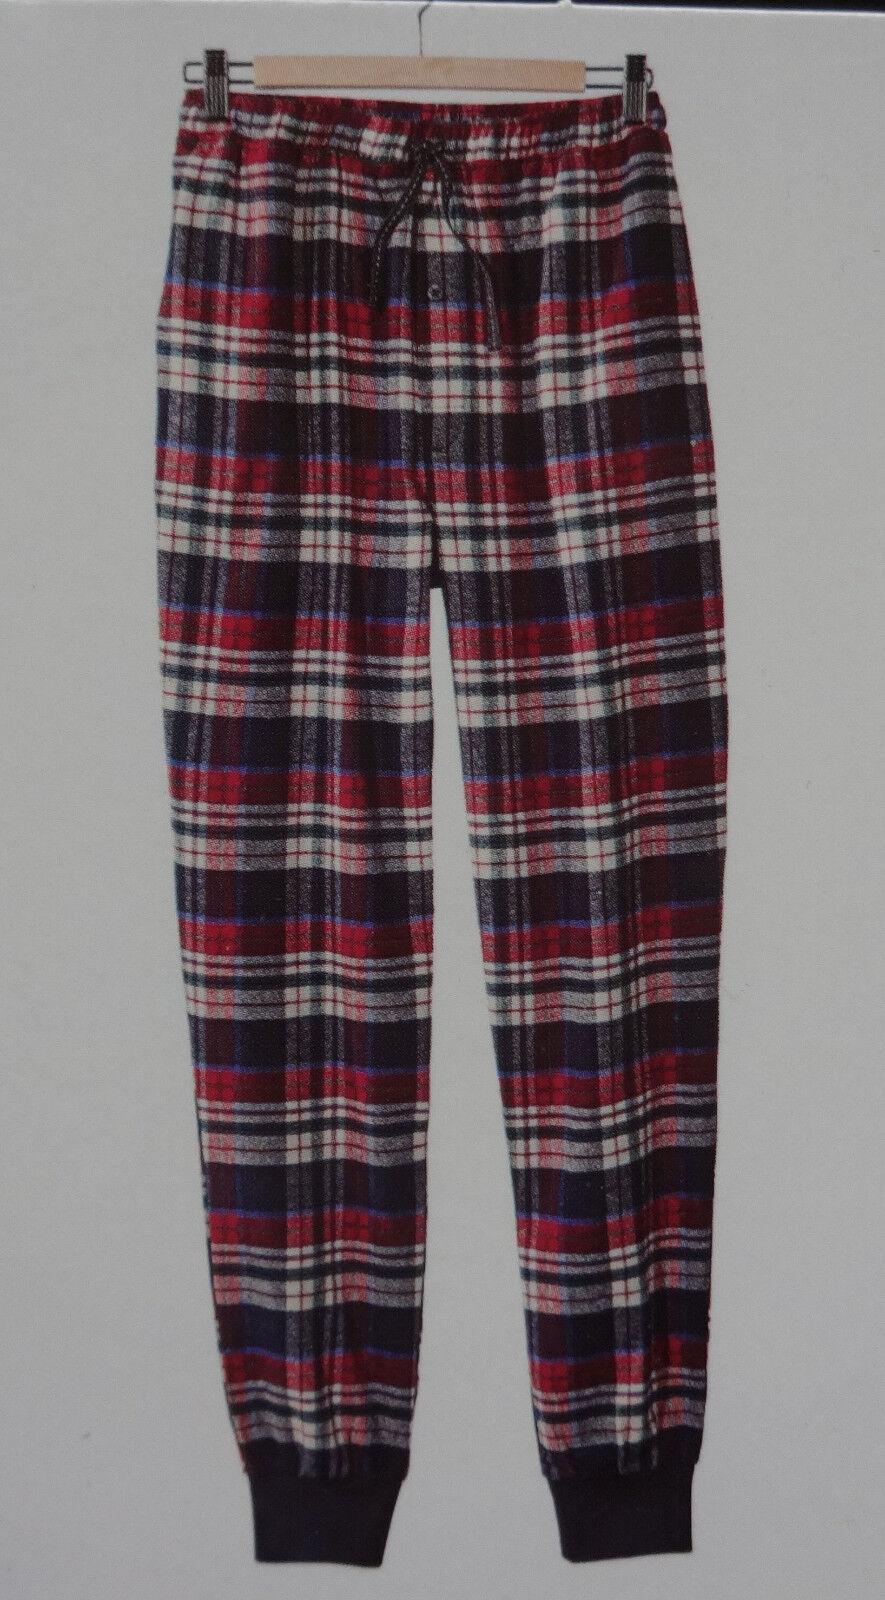 0aaae4ab20e162 NEU Herren Schlafhose Pyjama Flanell Hose kariert Relaxhose Rot Blau M L  XL*. von Livergy